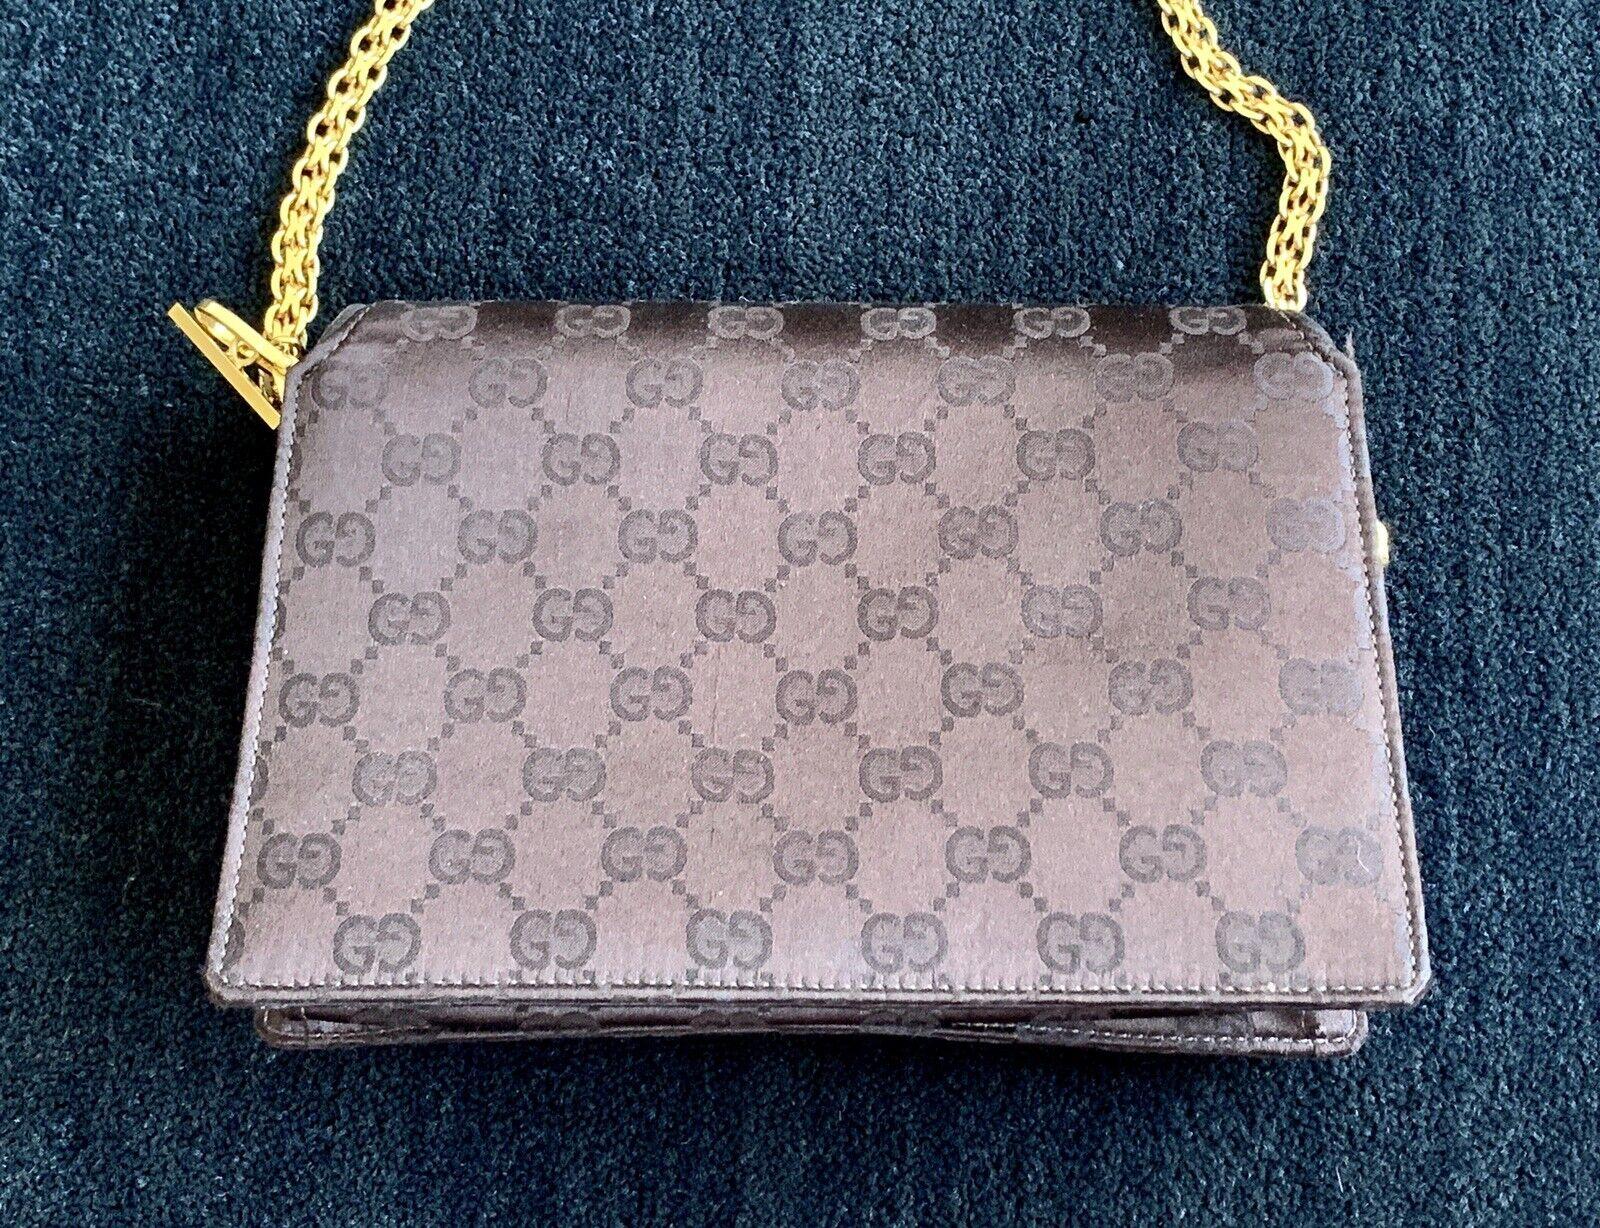 Gucci Vintage Classic Handbag with original box  - image 11